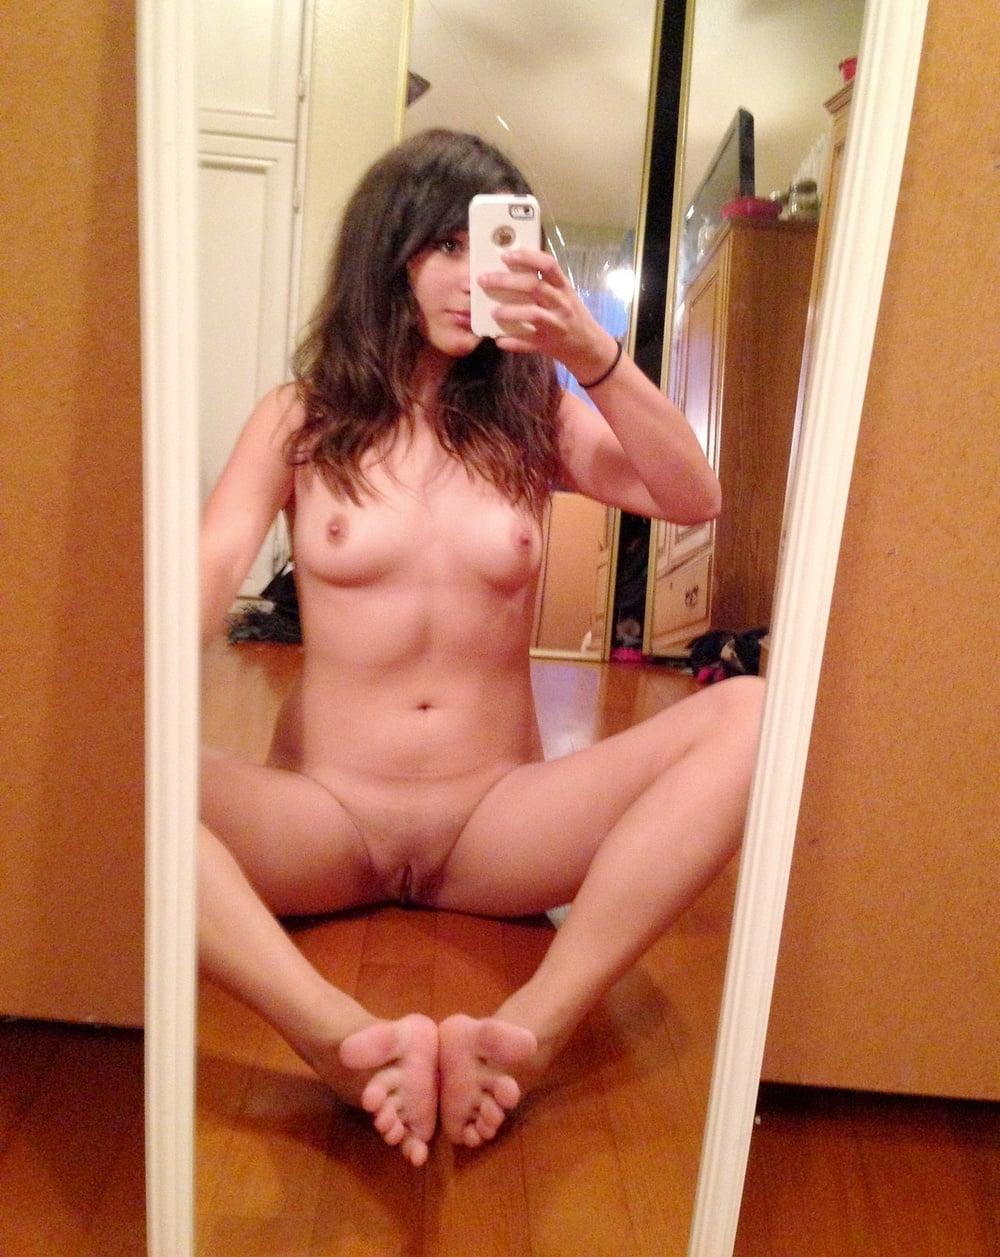 Сняли себя голышом, порно винтаж ретро туб